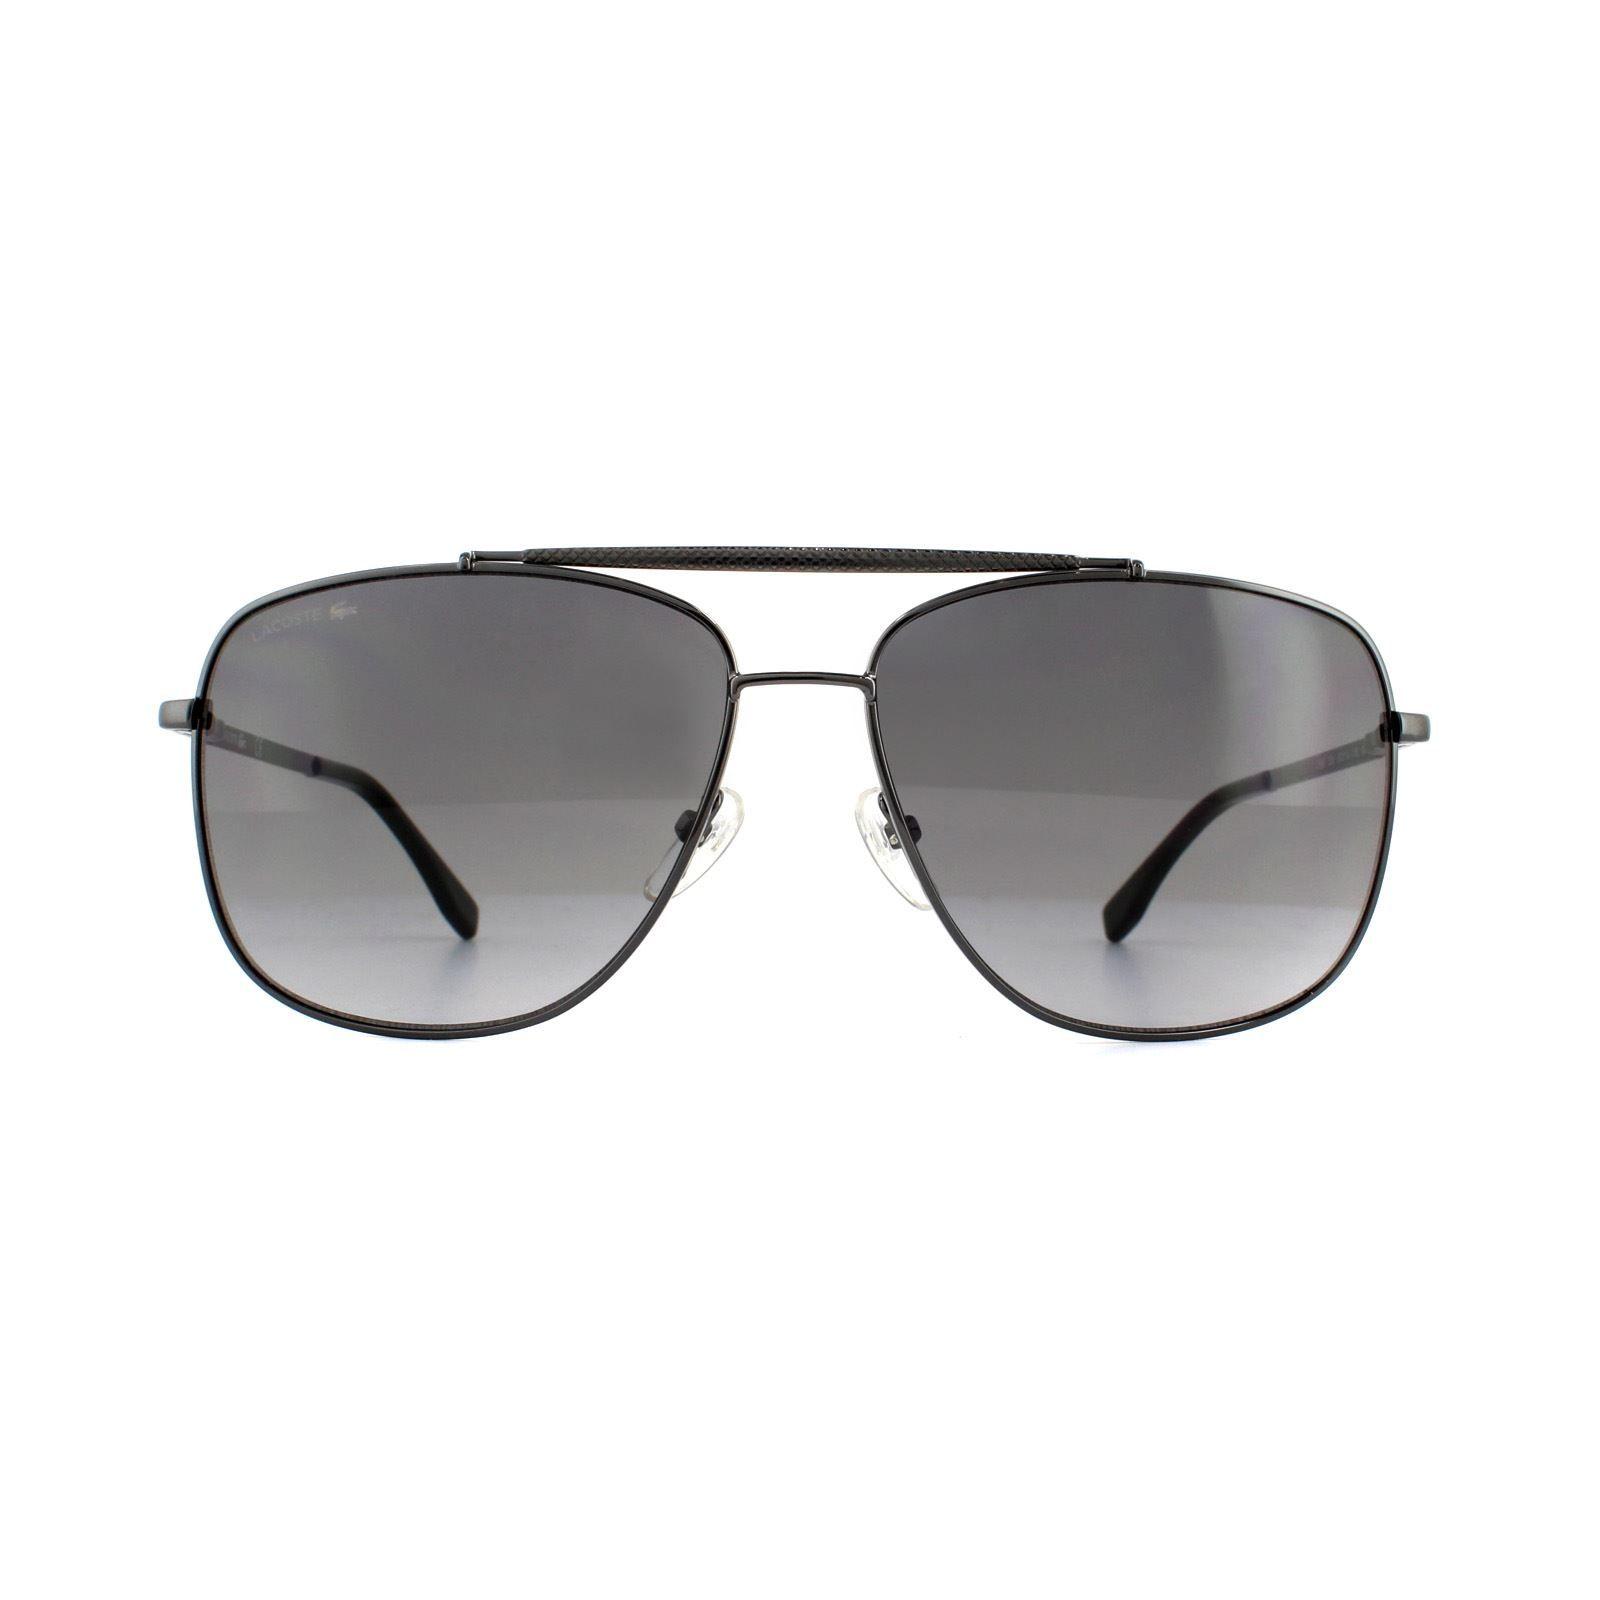 Lacoste Sunglasses L188S 033 Gunmetal Grey Gradient